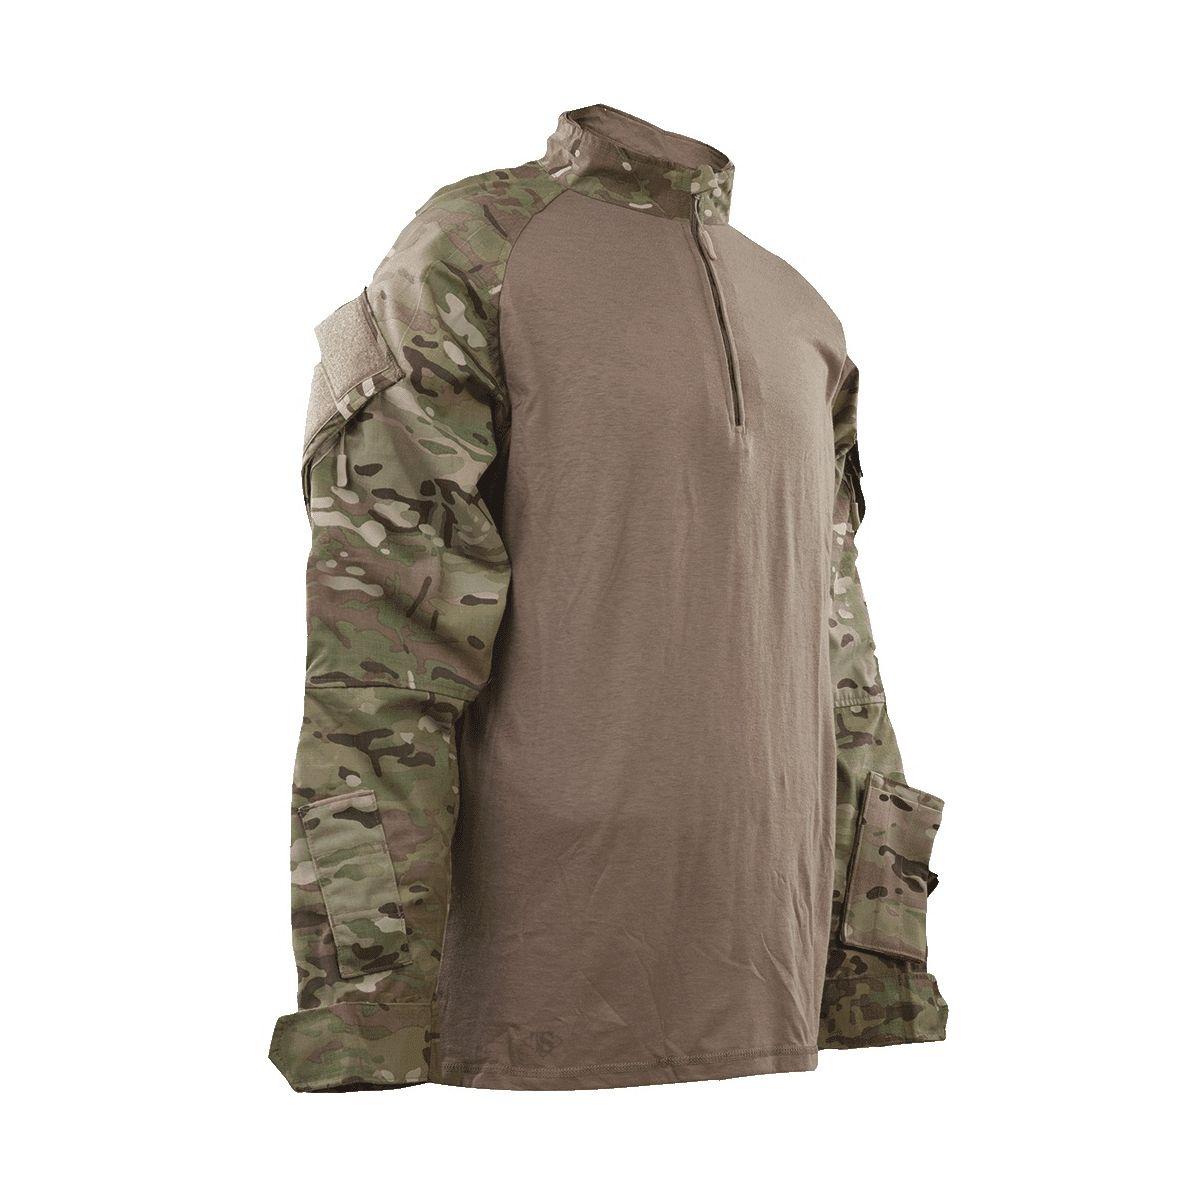 Košile taktická COMBAT TRU XTREME rip-stop MULTICAM® TRU-SPEC 25740 L-11